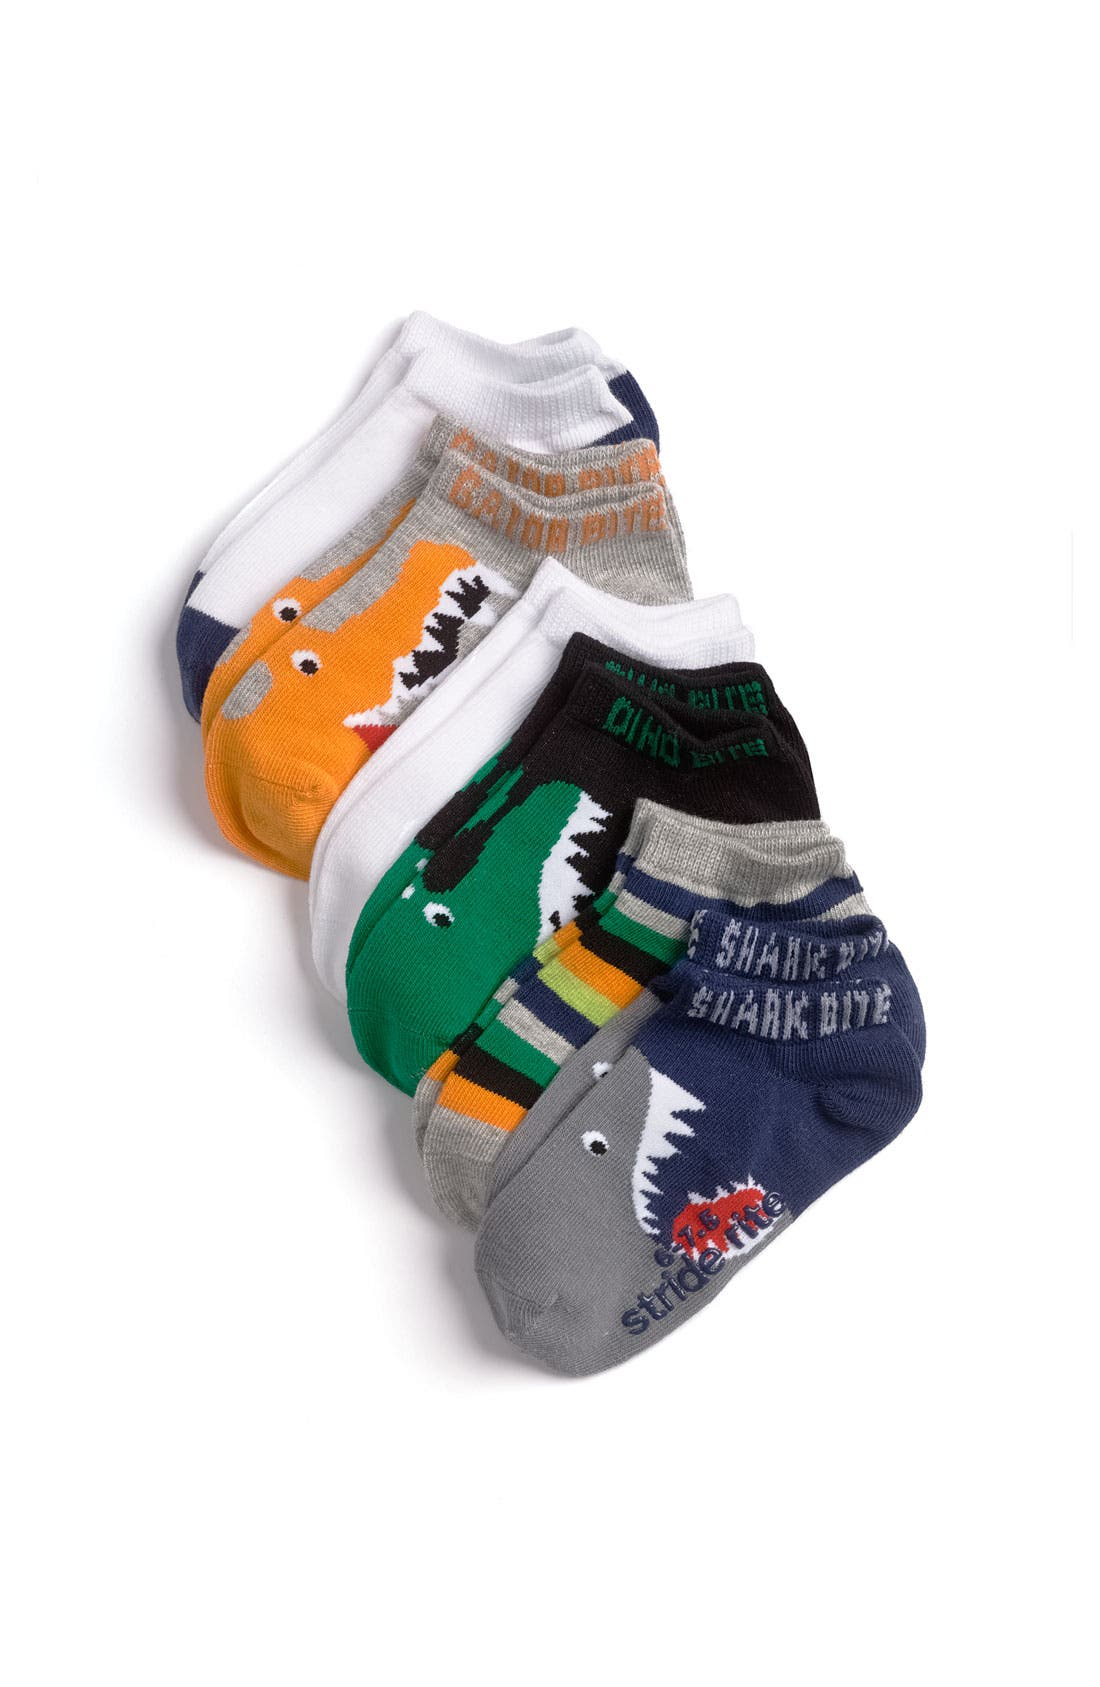 Main Image - Stride Rite 'Big Bites' Socks (6-Pack) (Toddler & Little Kid)